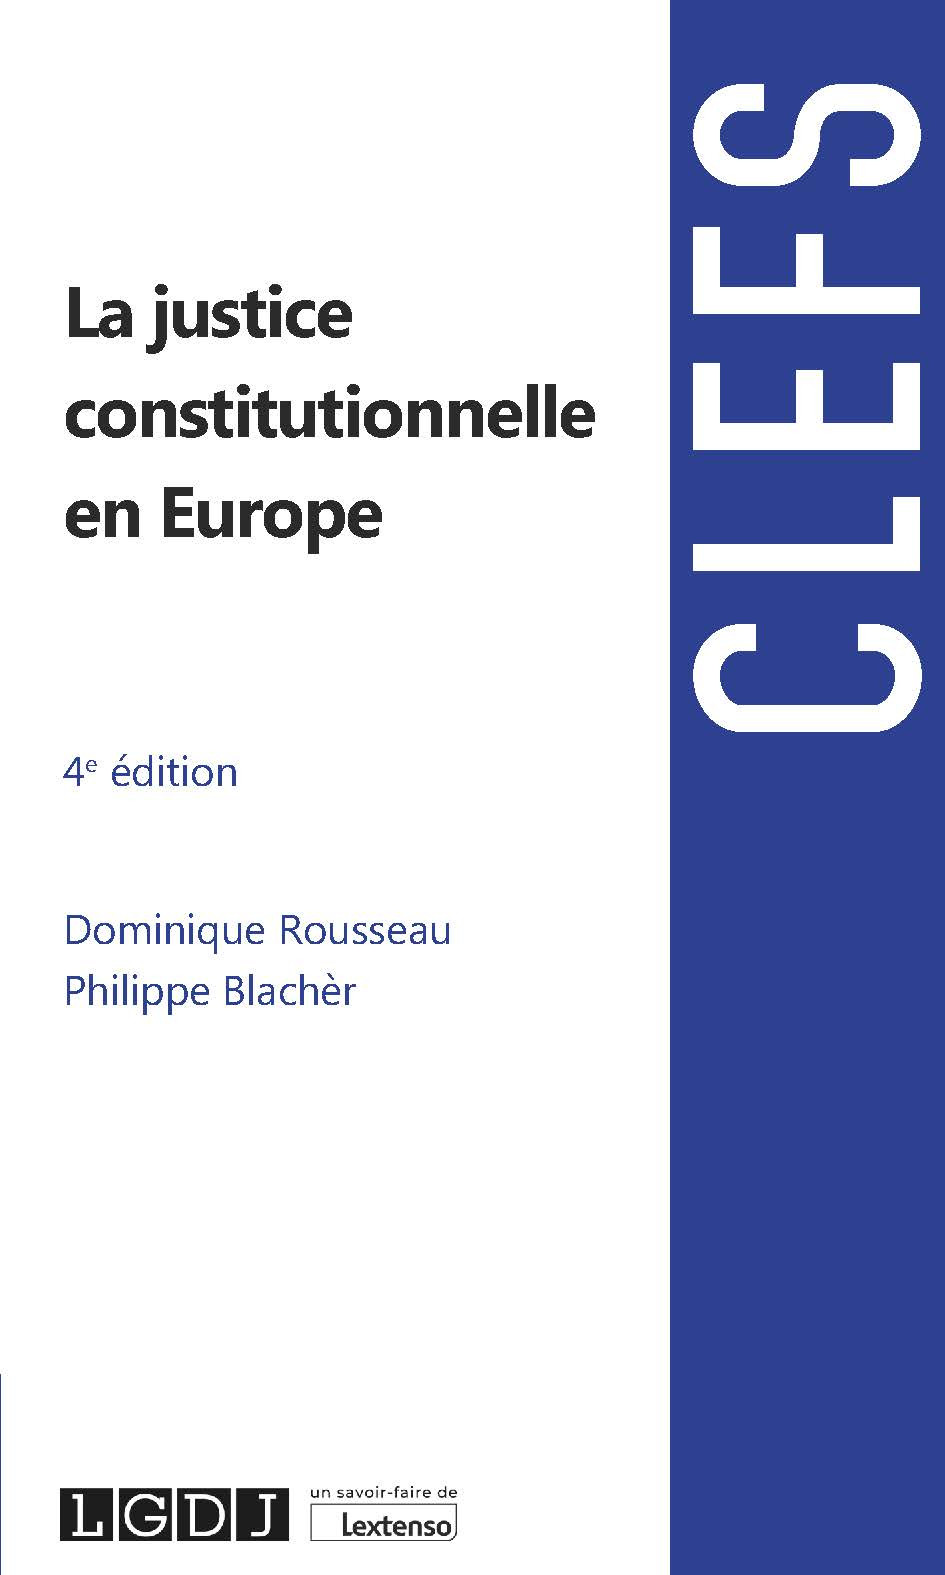 [EBOOK] La justice constitutionnelle en Europe